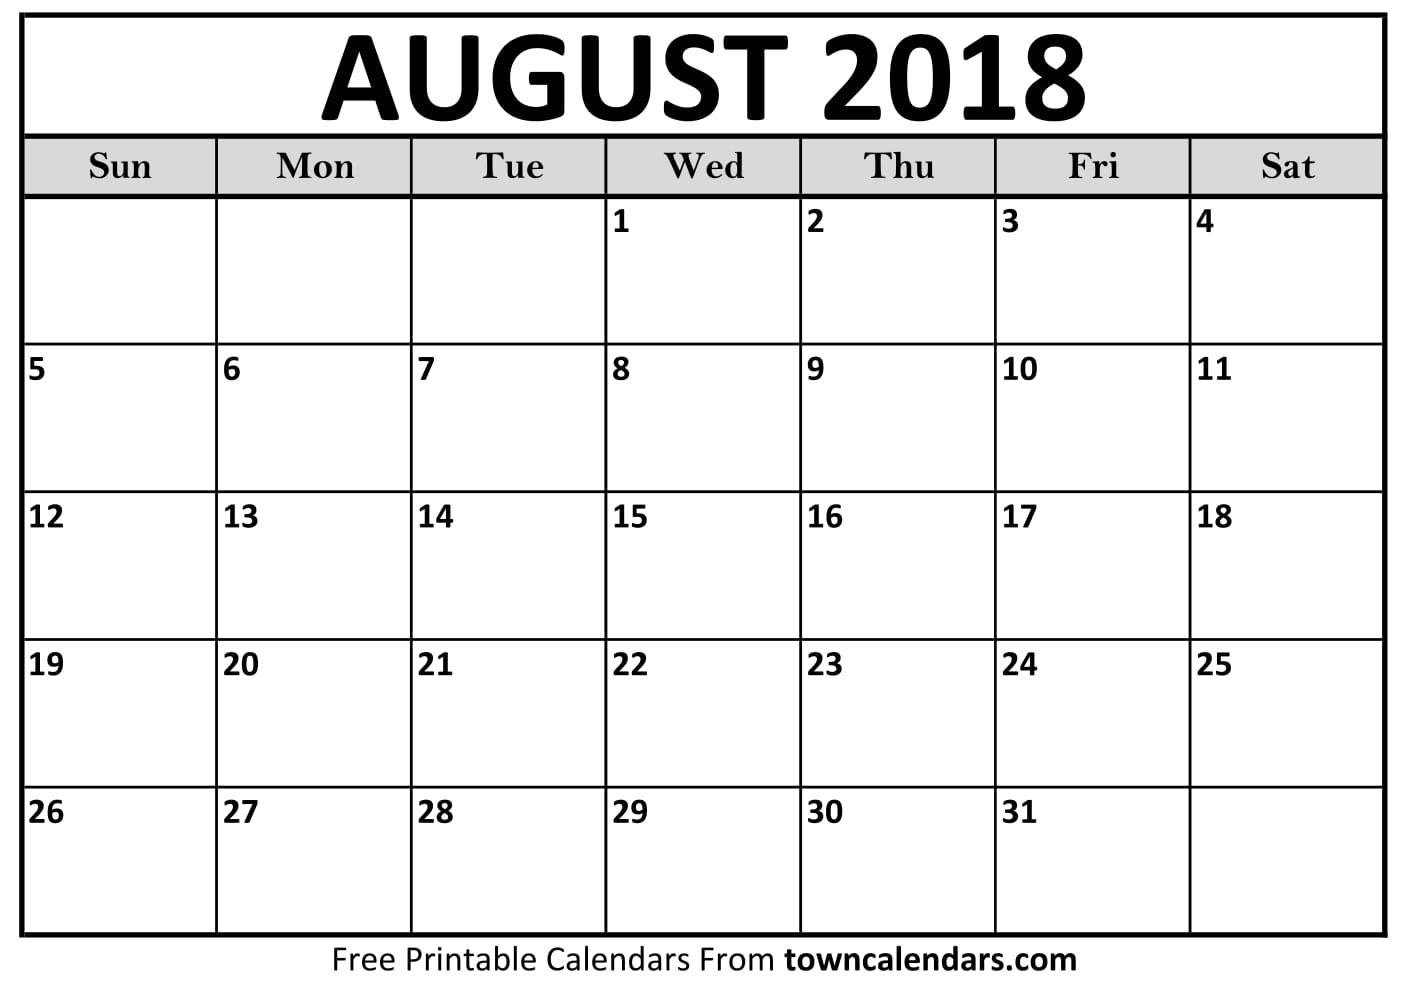 Printable August 2018 Calendar - Towncalendars  Picture Of August On Calendar